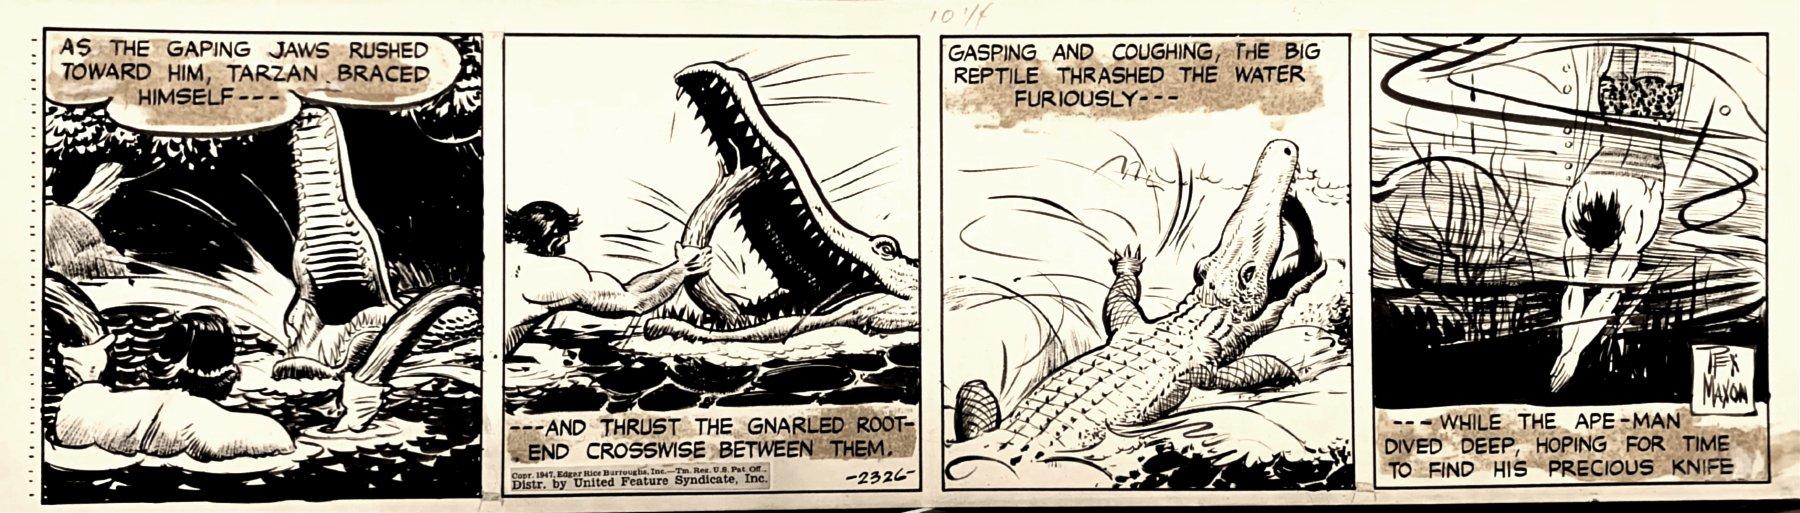 Tarzan Daily Strip (TARZAN BATTLING CROCODILE IN EVERY PANEL!) 1947